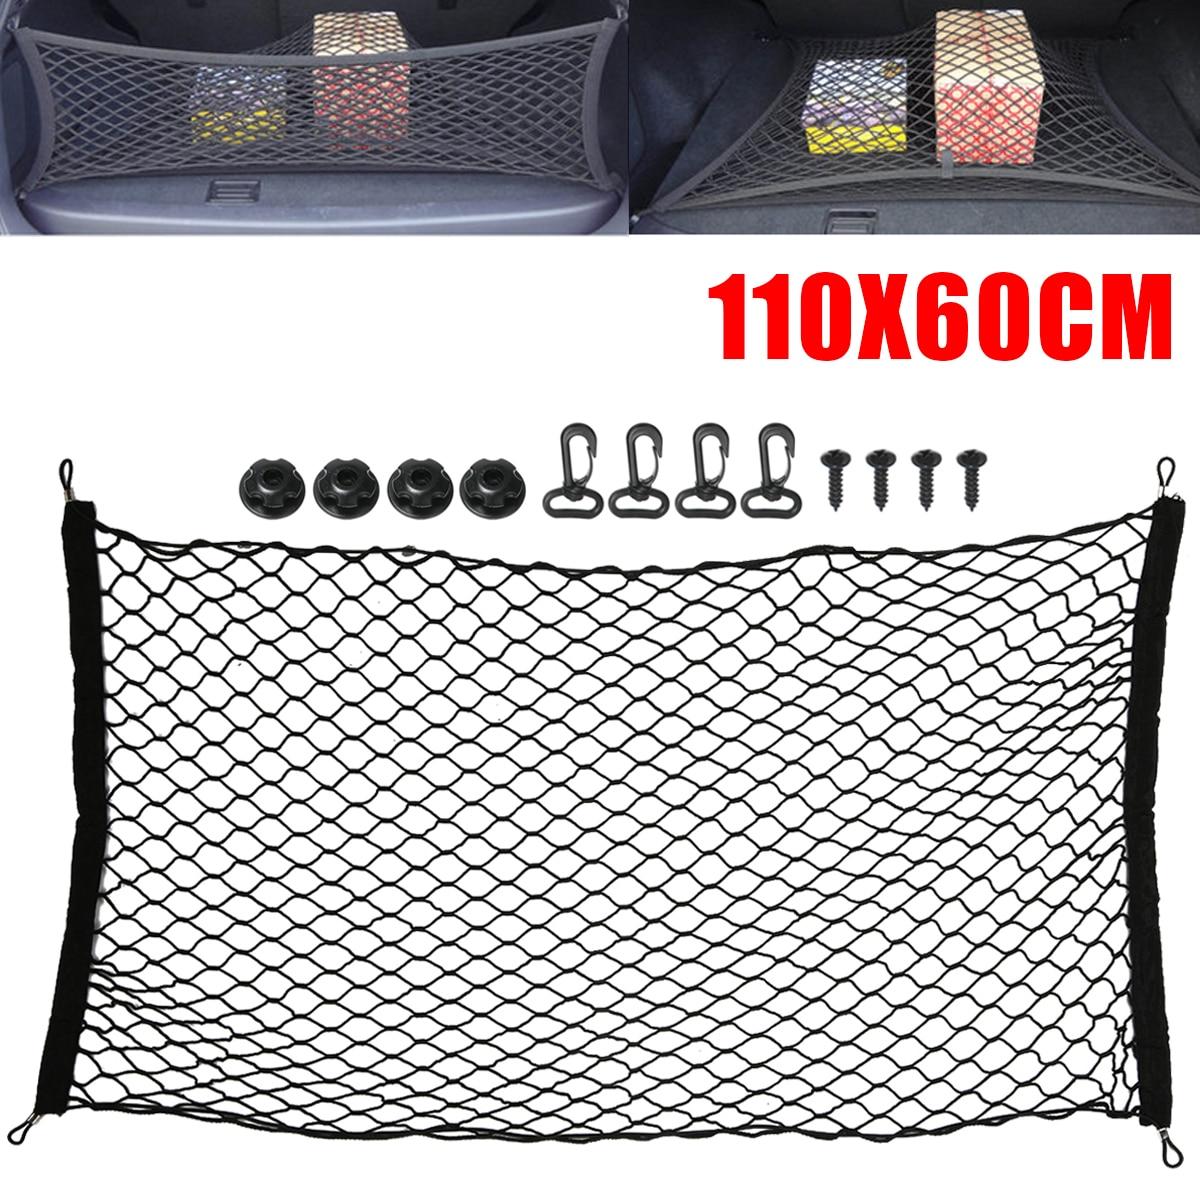 110x60cm Car Styling Car Cargo Net Nylon Elastic Mesh Luggage Storage Net For SUV Pickup Truck